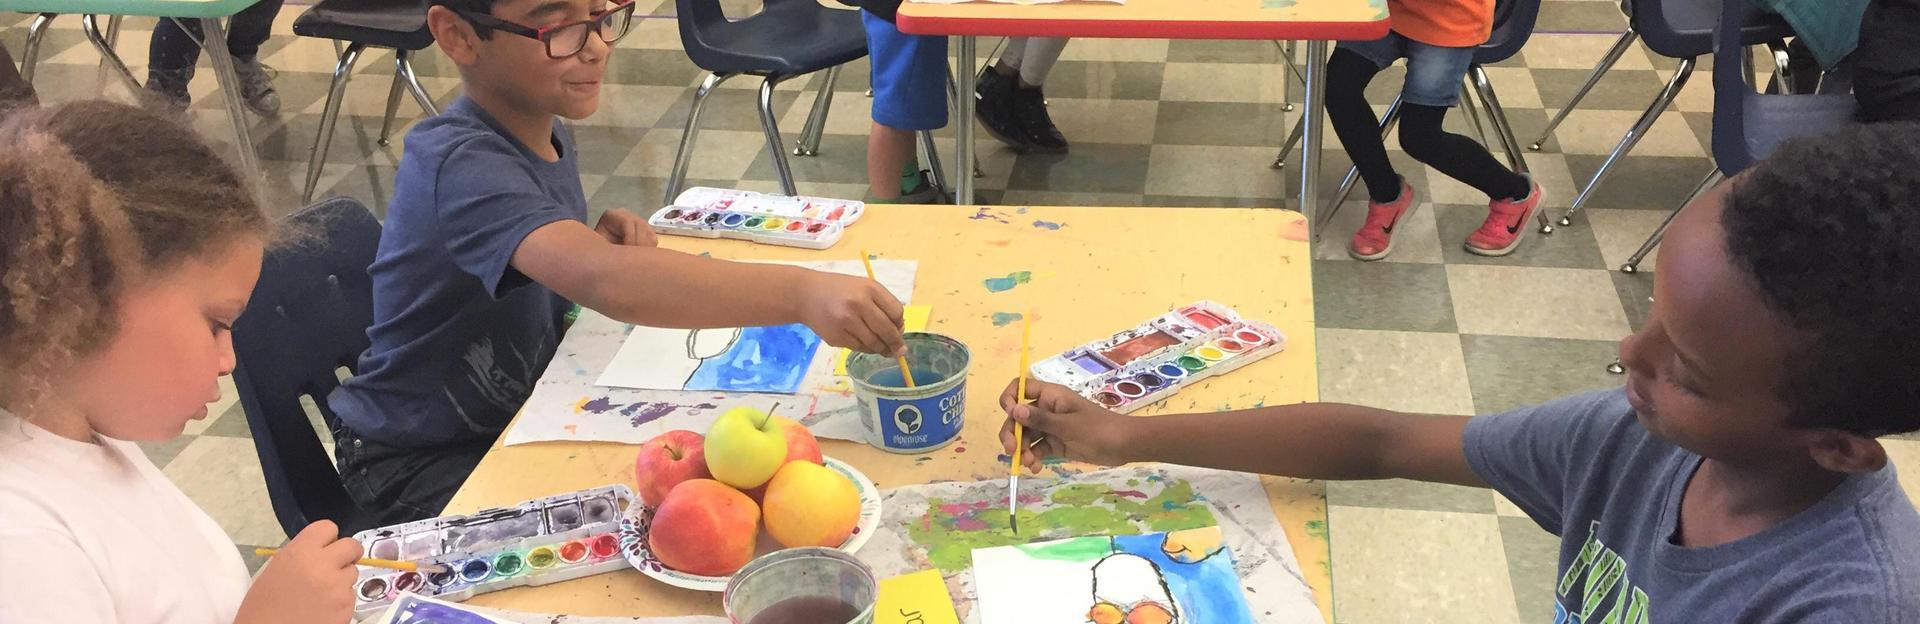 Second graders in art class